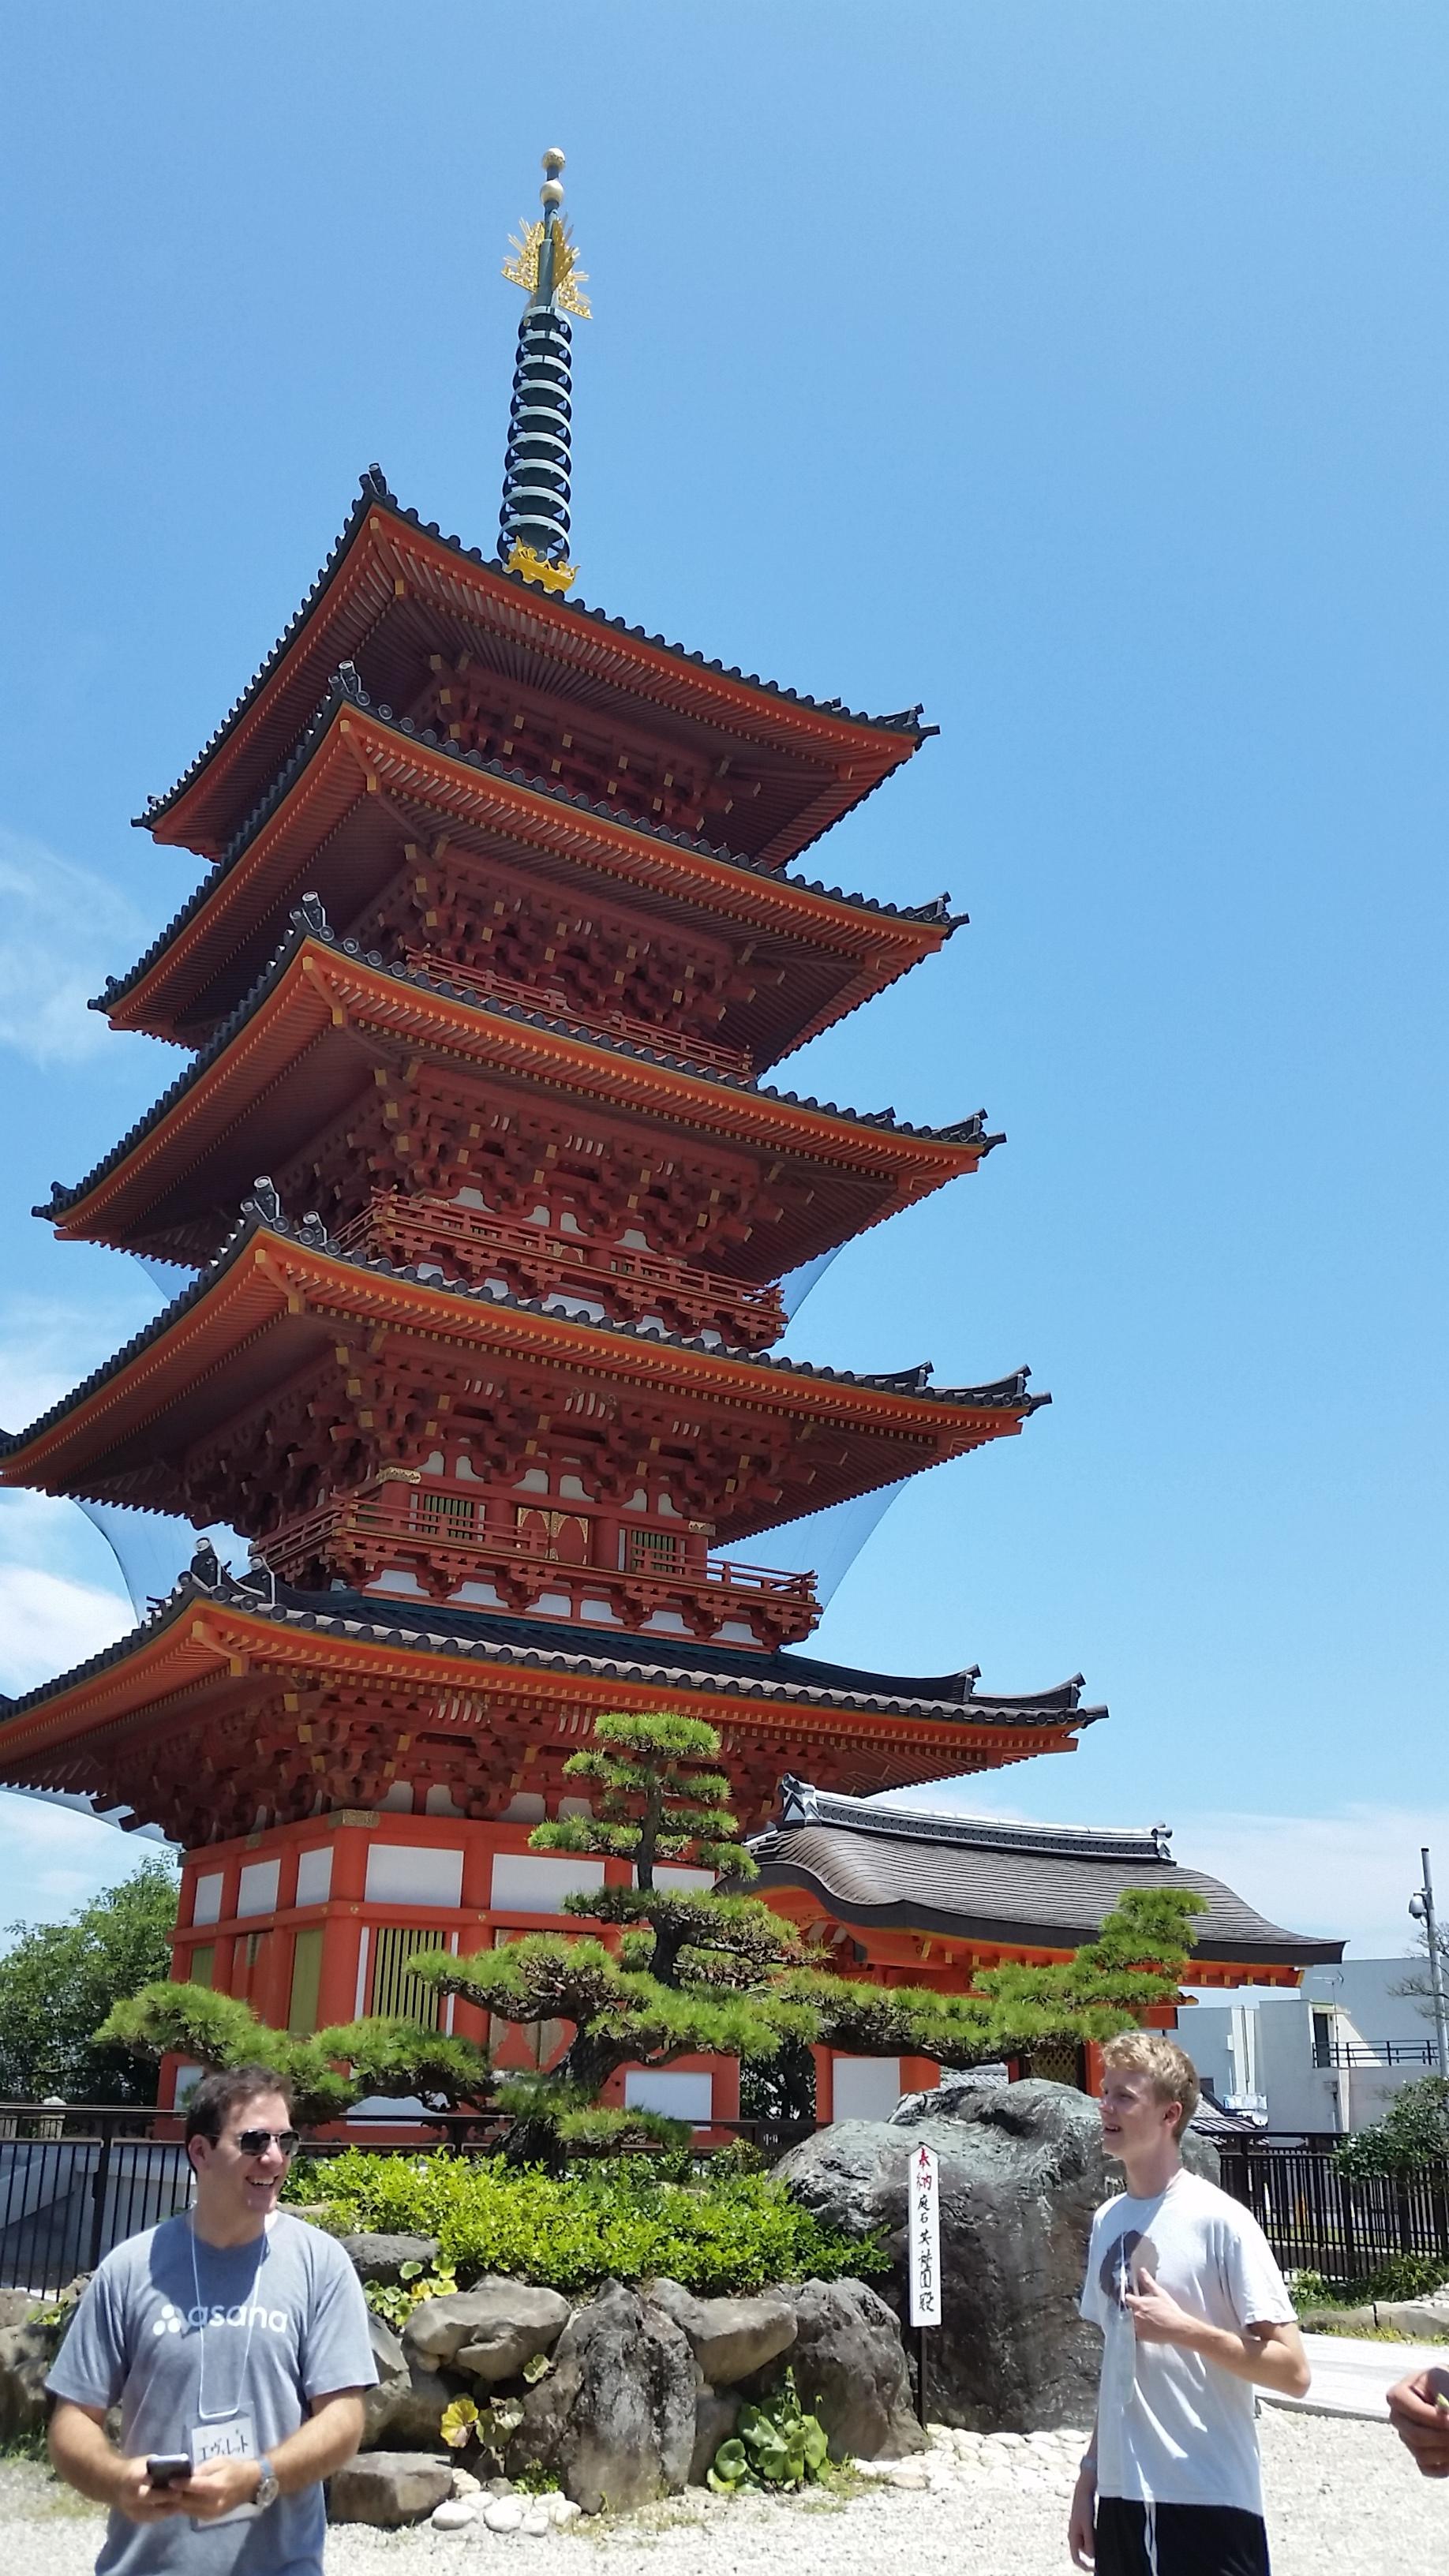 A very impressive pagoda at Enpuku-ji temple in Choshi